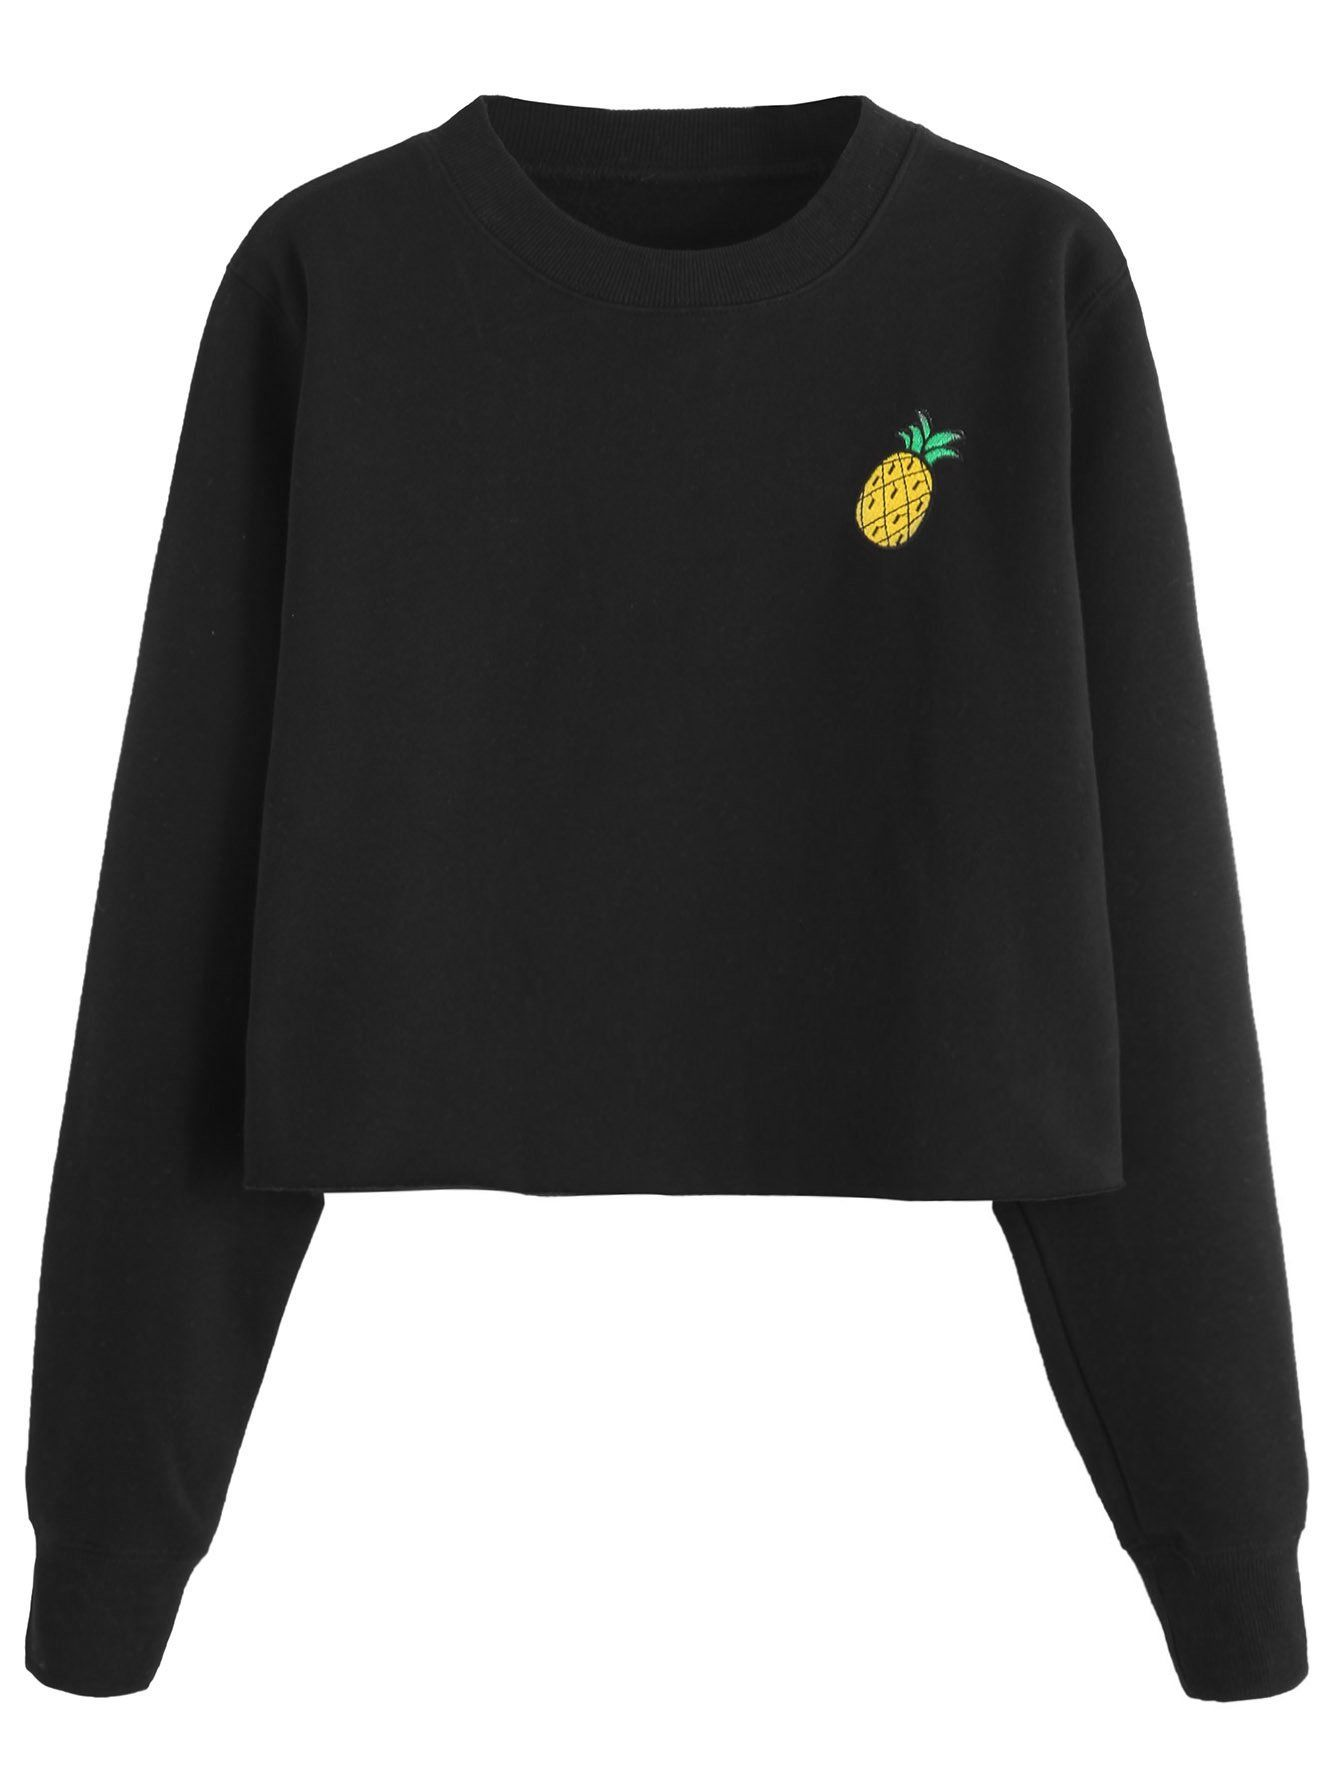 Black Pineapple Embroidered Crop Sweatshirt Crop Sweatshirt Sweatshirts Women Sweatshirts [ 1785 x 1340 Pixel ]